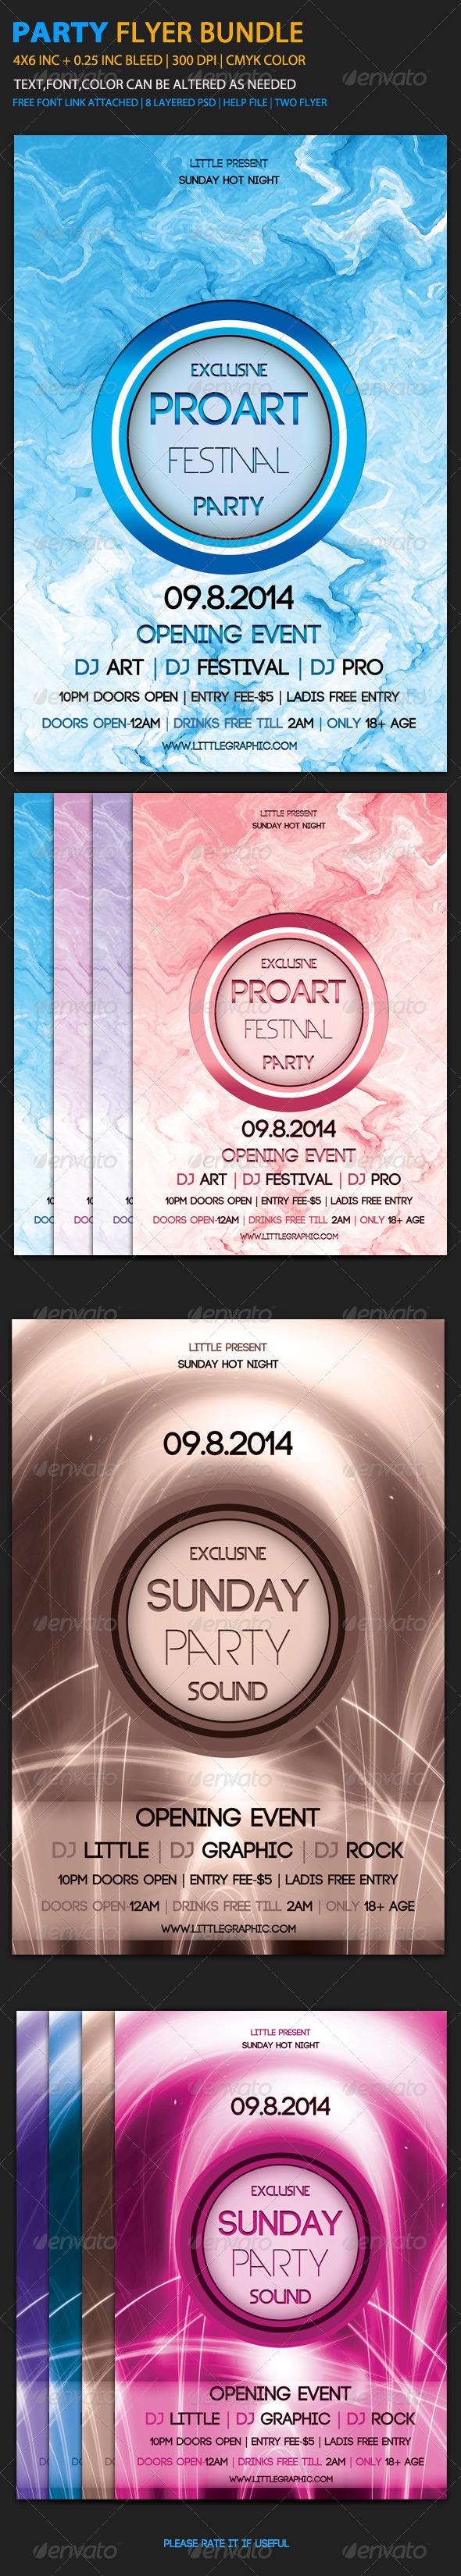 GraphicRiver Party Flyer Bundle 1 6058270